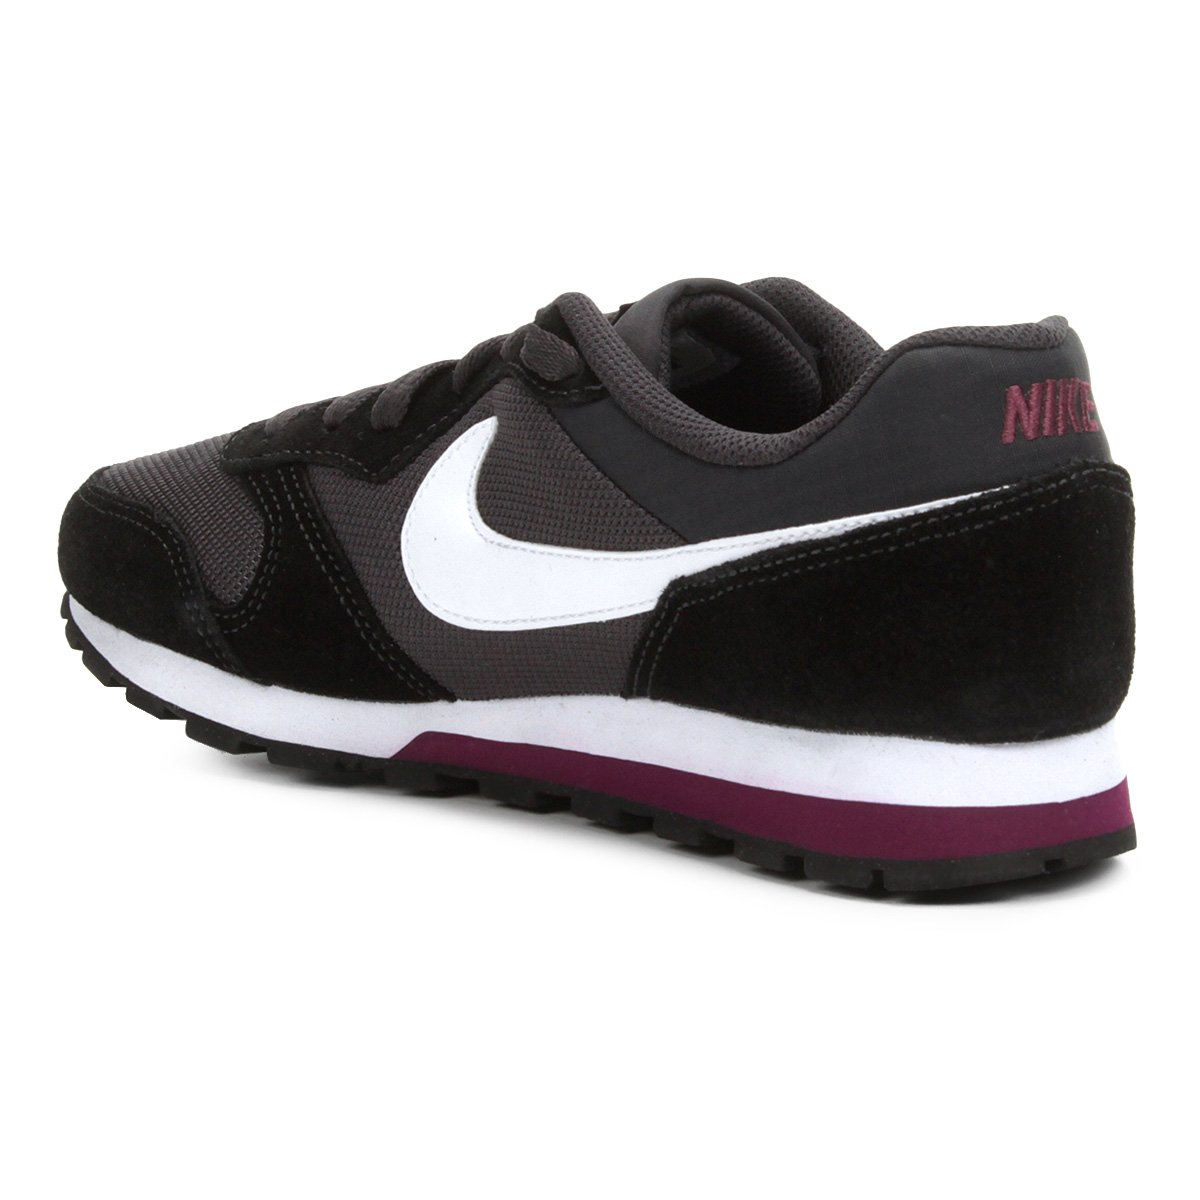 40f5c2ccd3158 Tênis Nike Md Runner 2 Feminino - Tam: 40 - Shopping TudoAzul